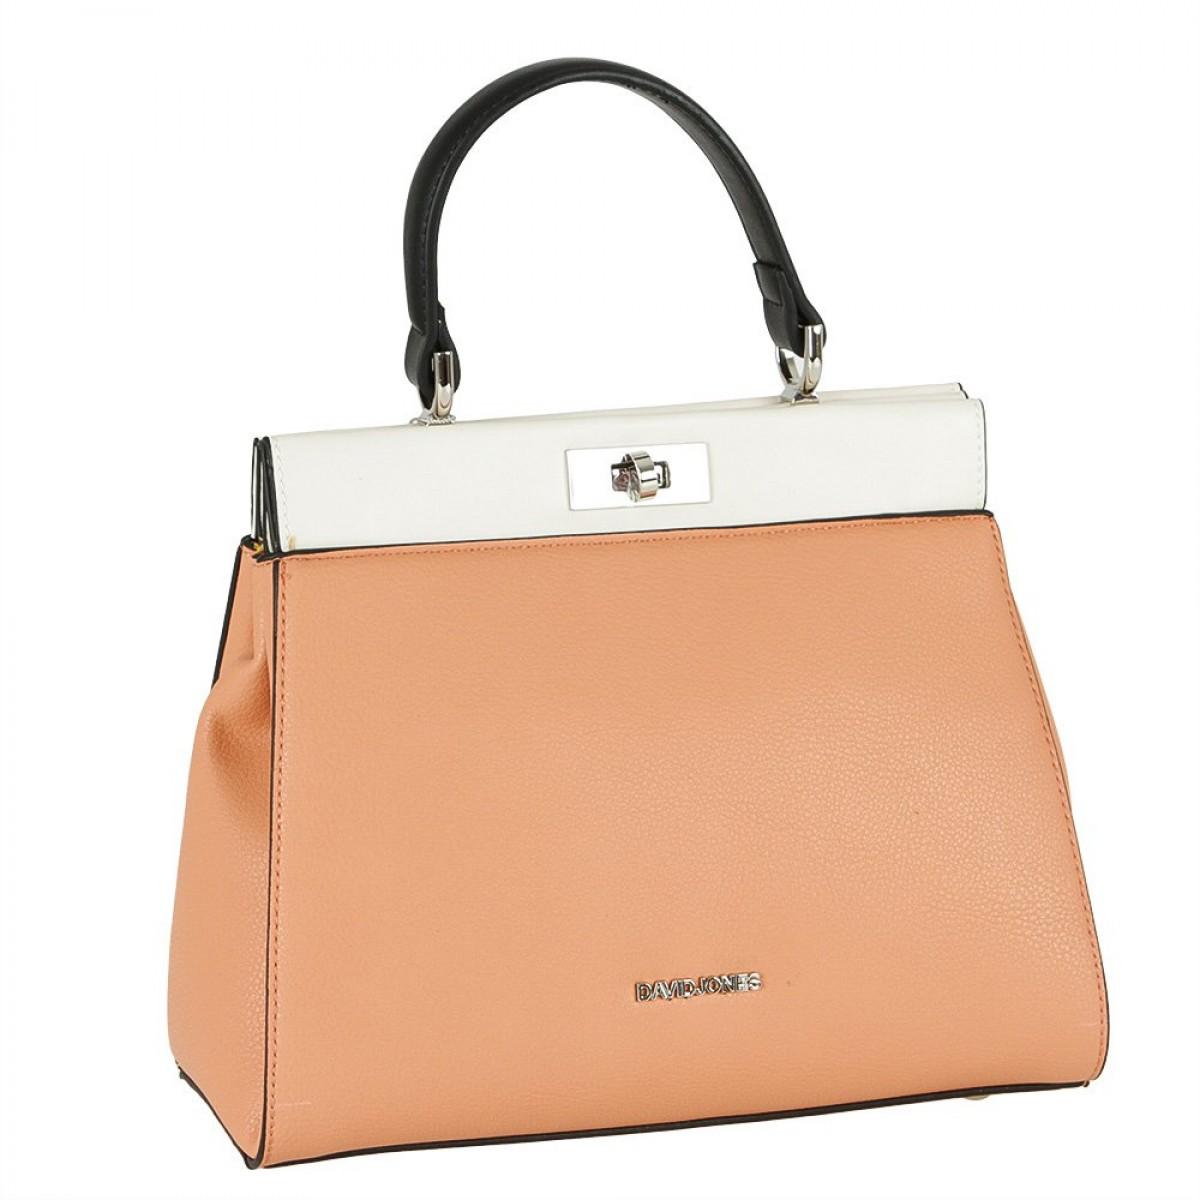 Жіноча сумка David Jones 6310-1 CORAL